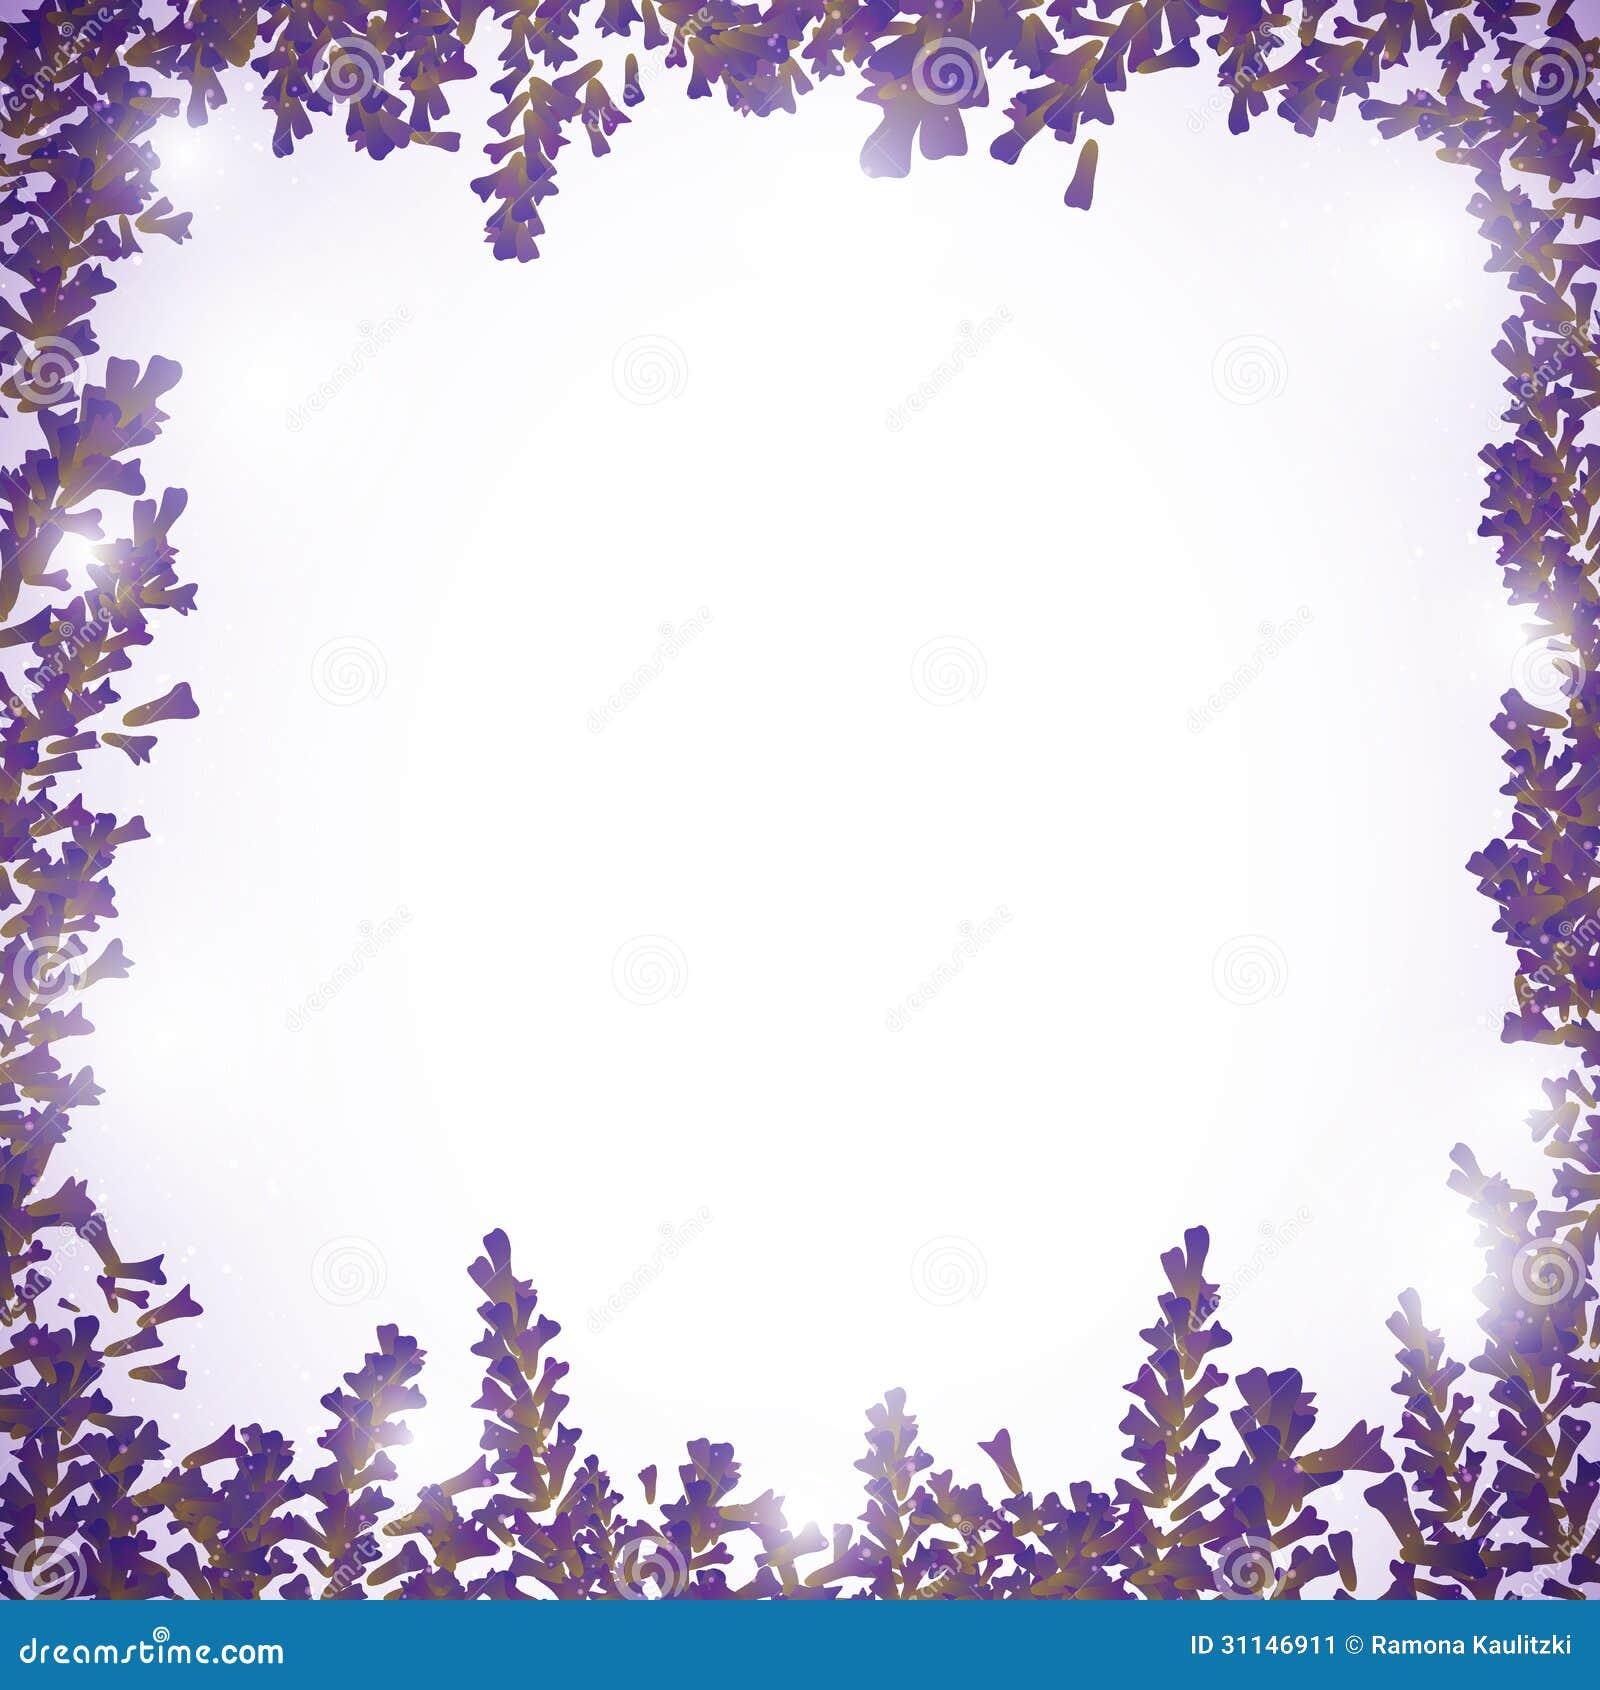 Lavender Background Stock Image - Image: 31146911